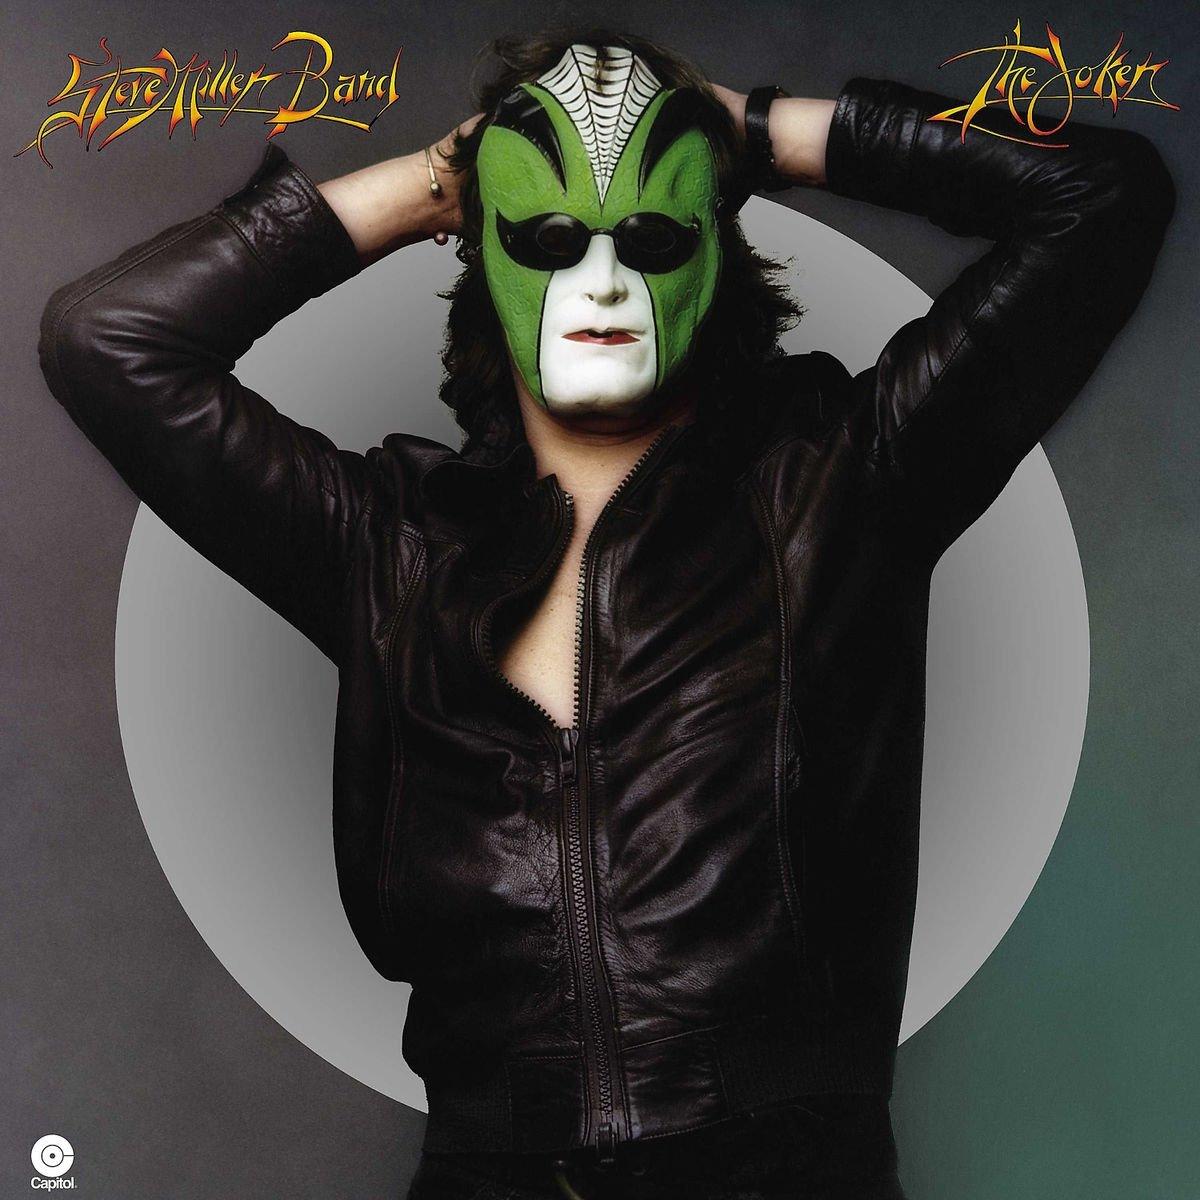 The Joker : Steve Miller Band, Steve Miller Band: Amazon.es: CDs y vinilos}